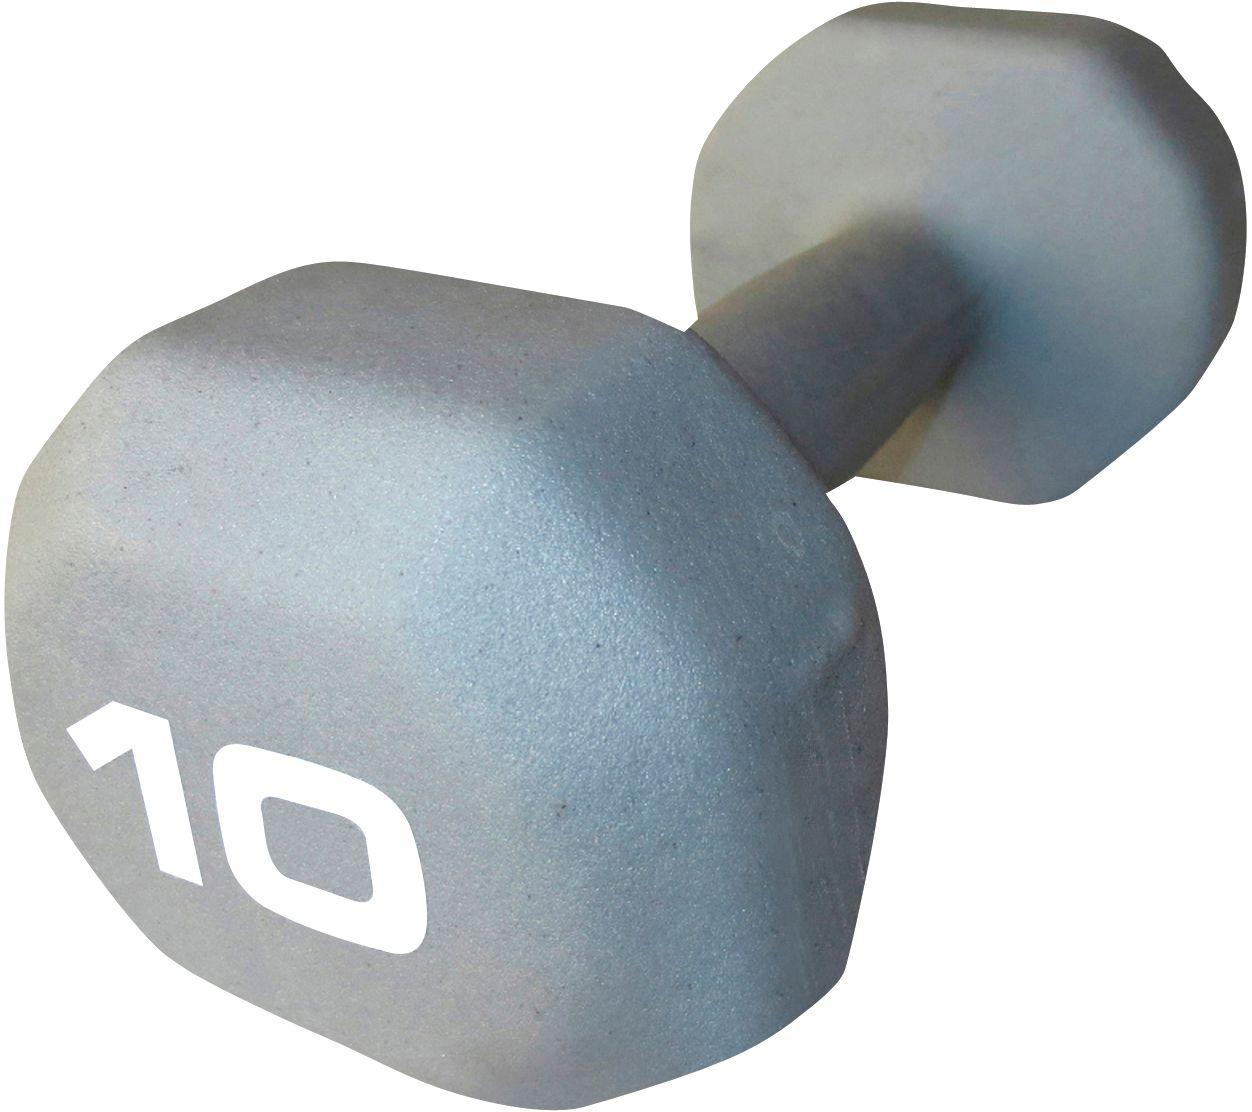 dicks hand weights